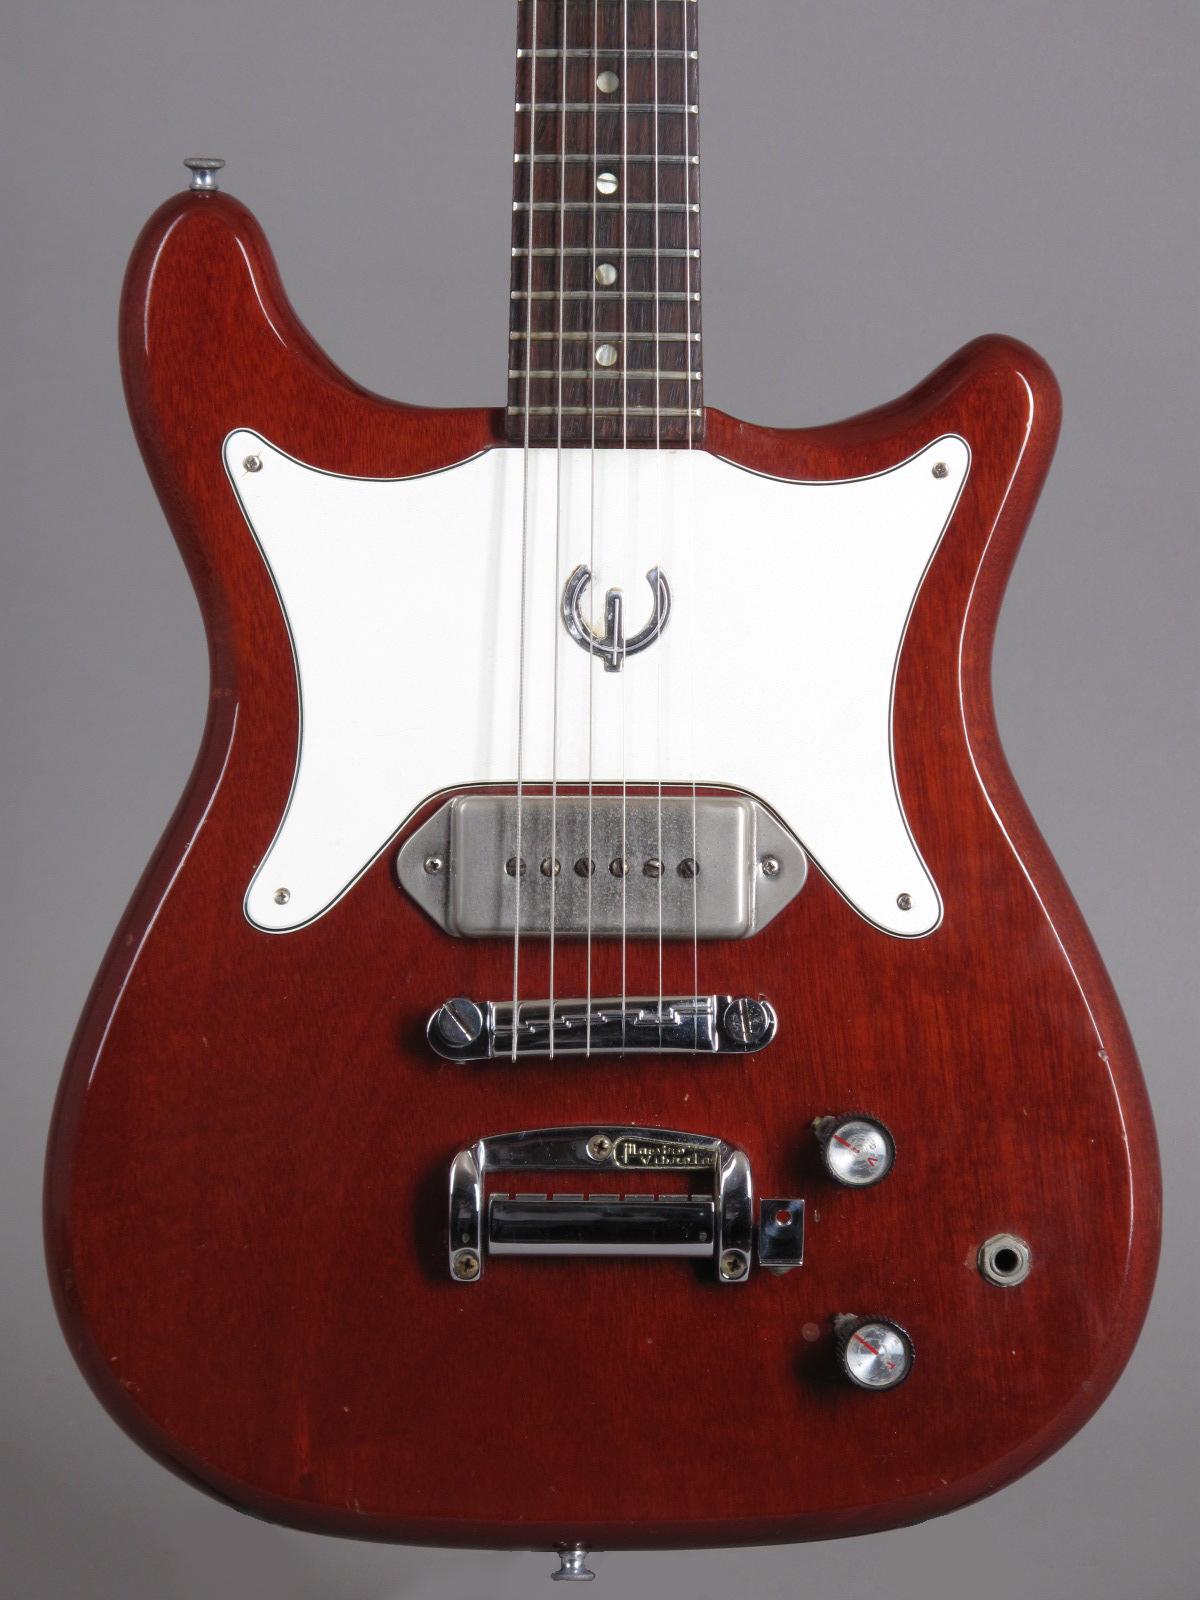 1965Epiphone Coronet - Cherry